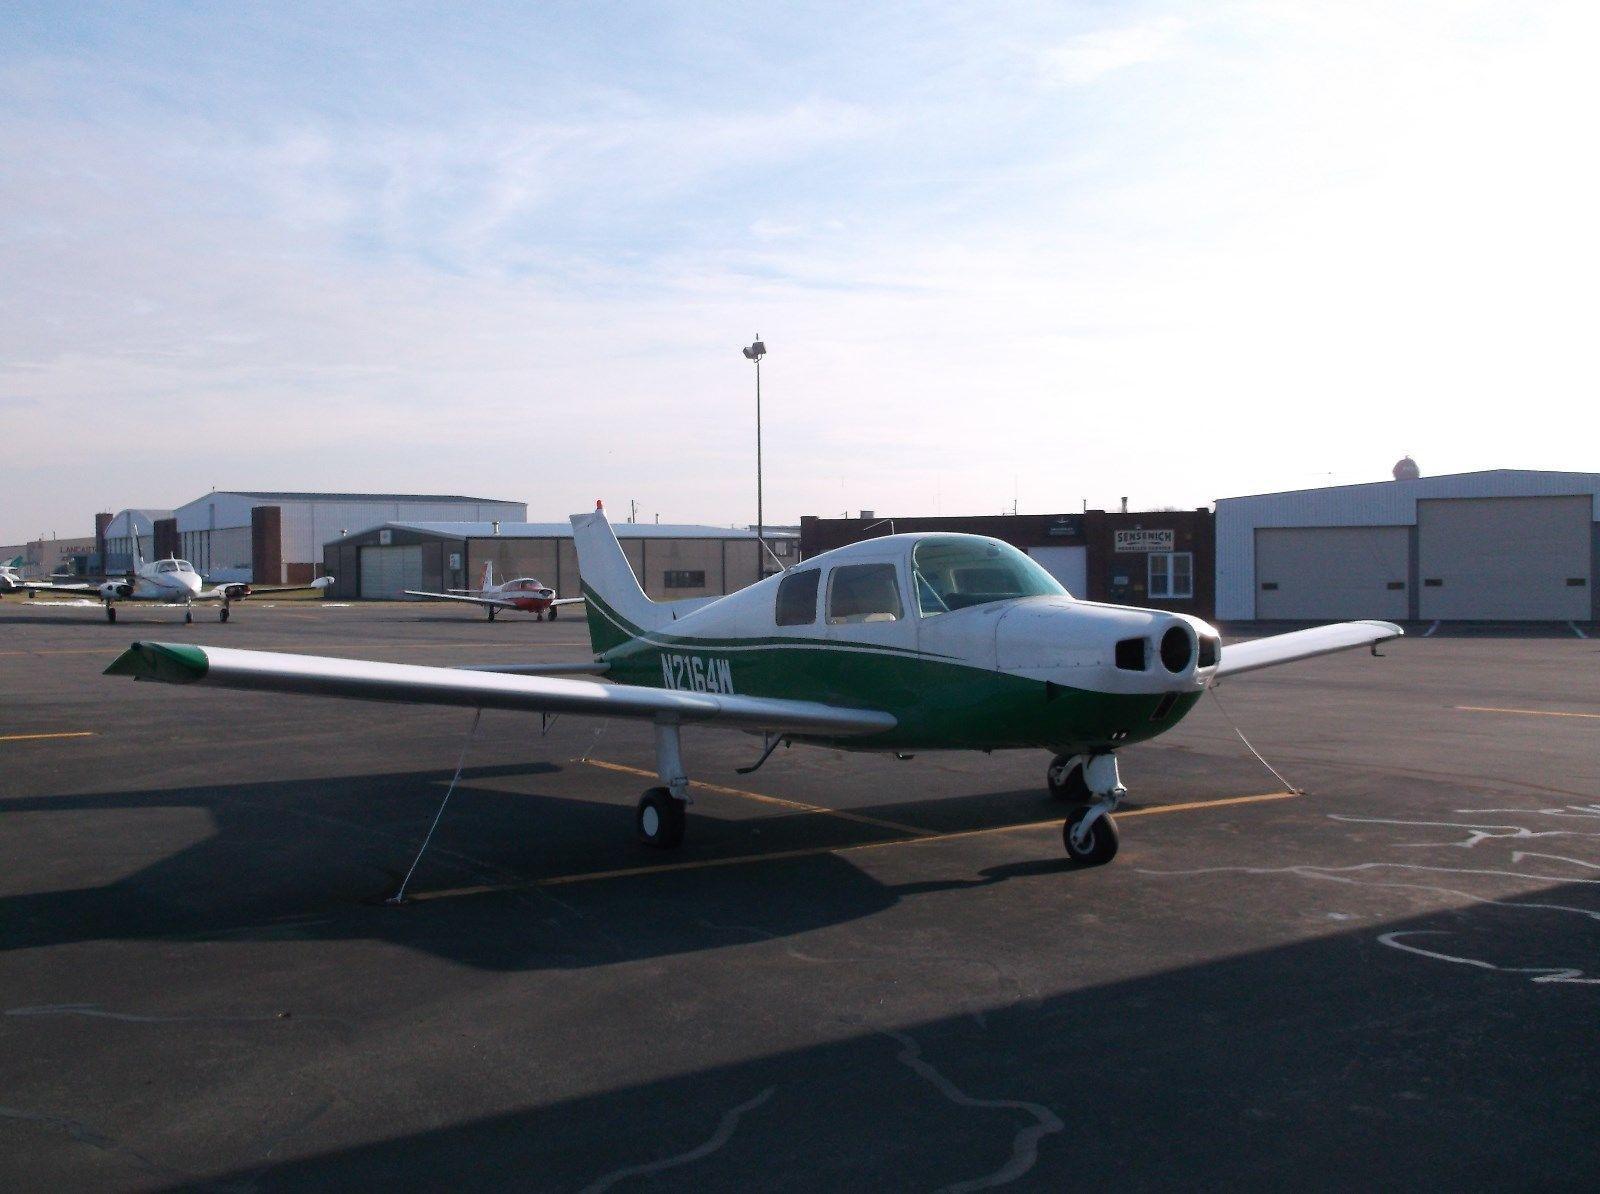 Sport Airframe 1974 Beechcraft B 19 aircraft for sale